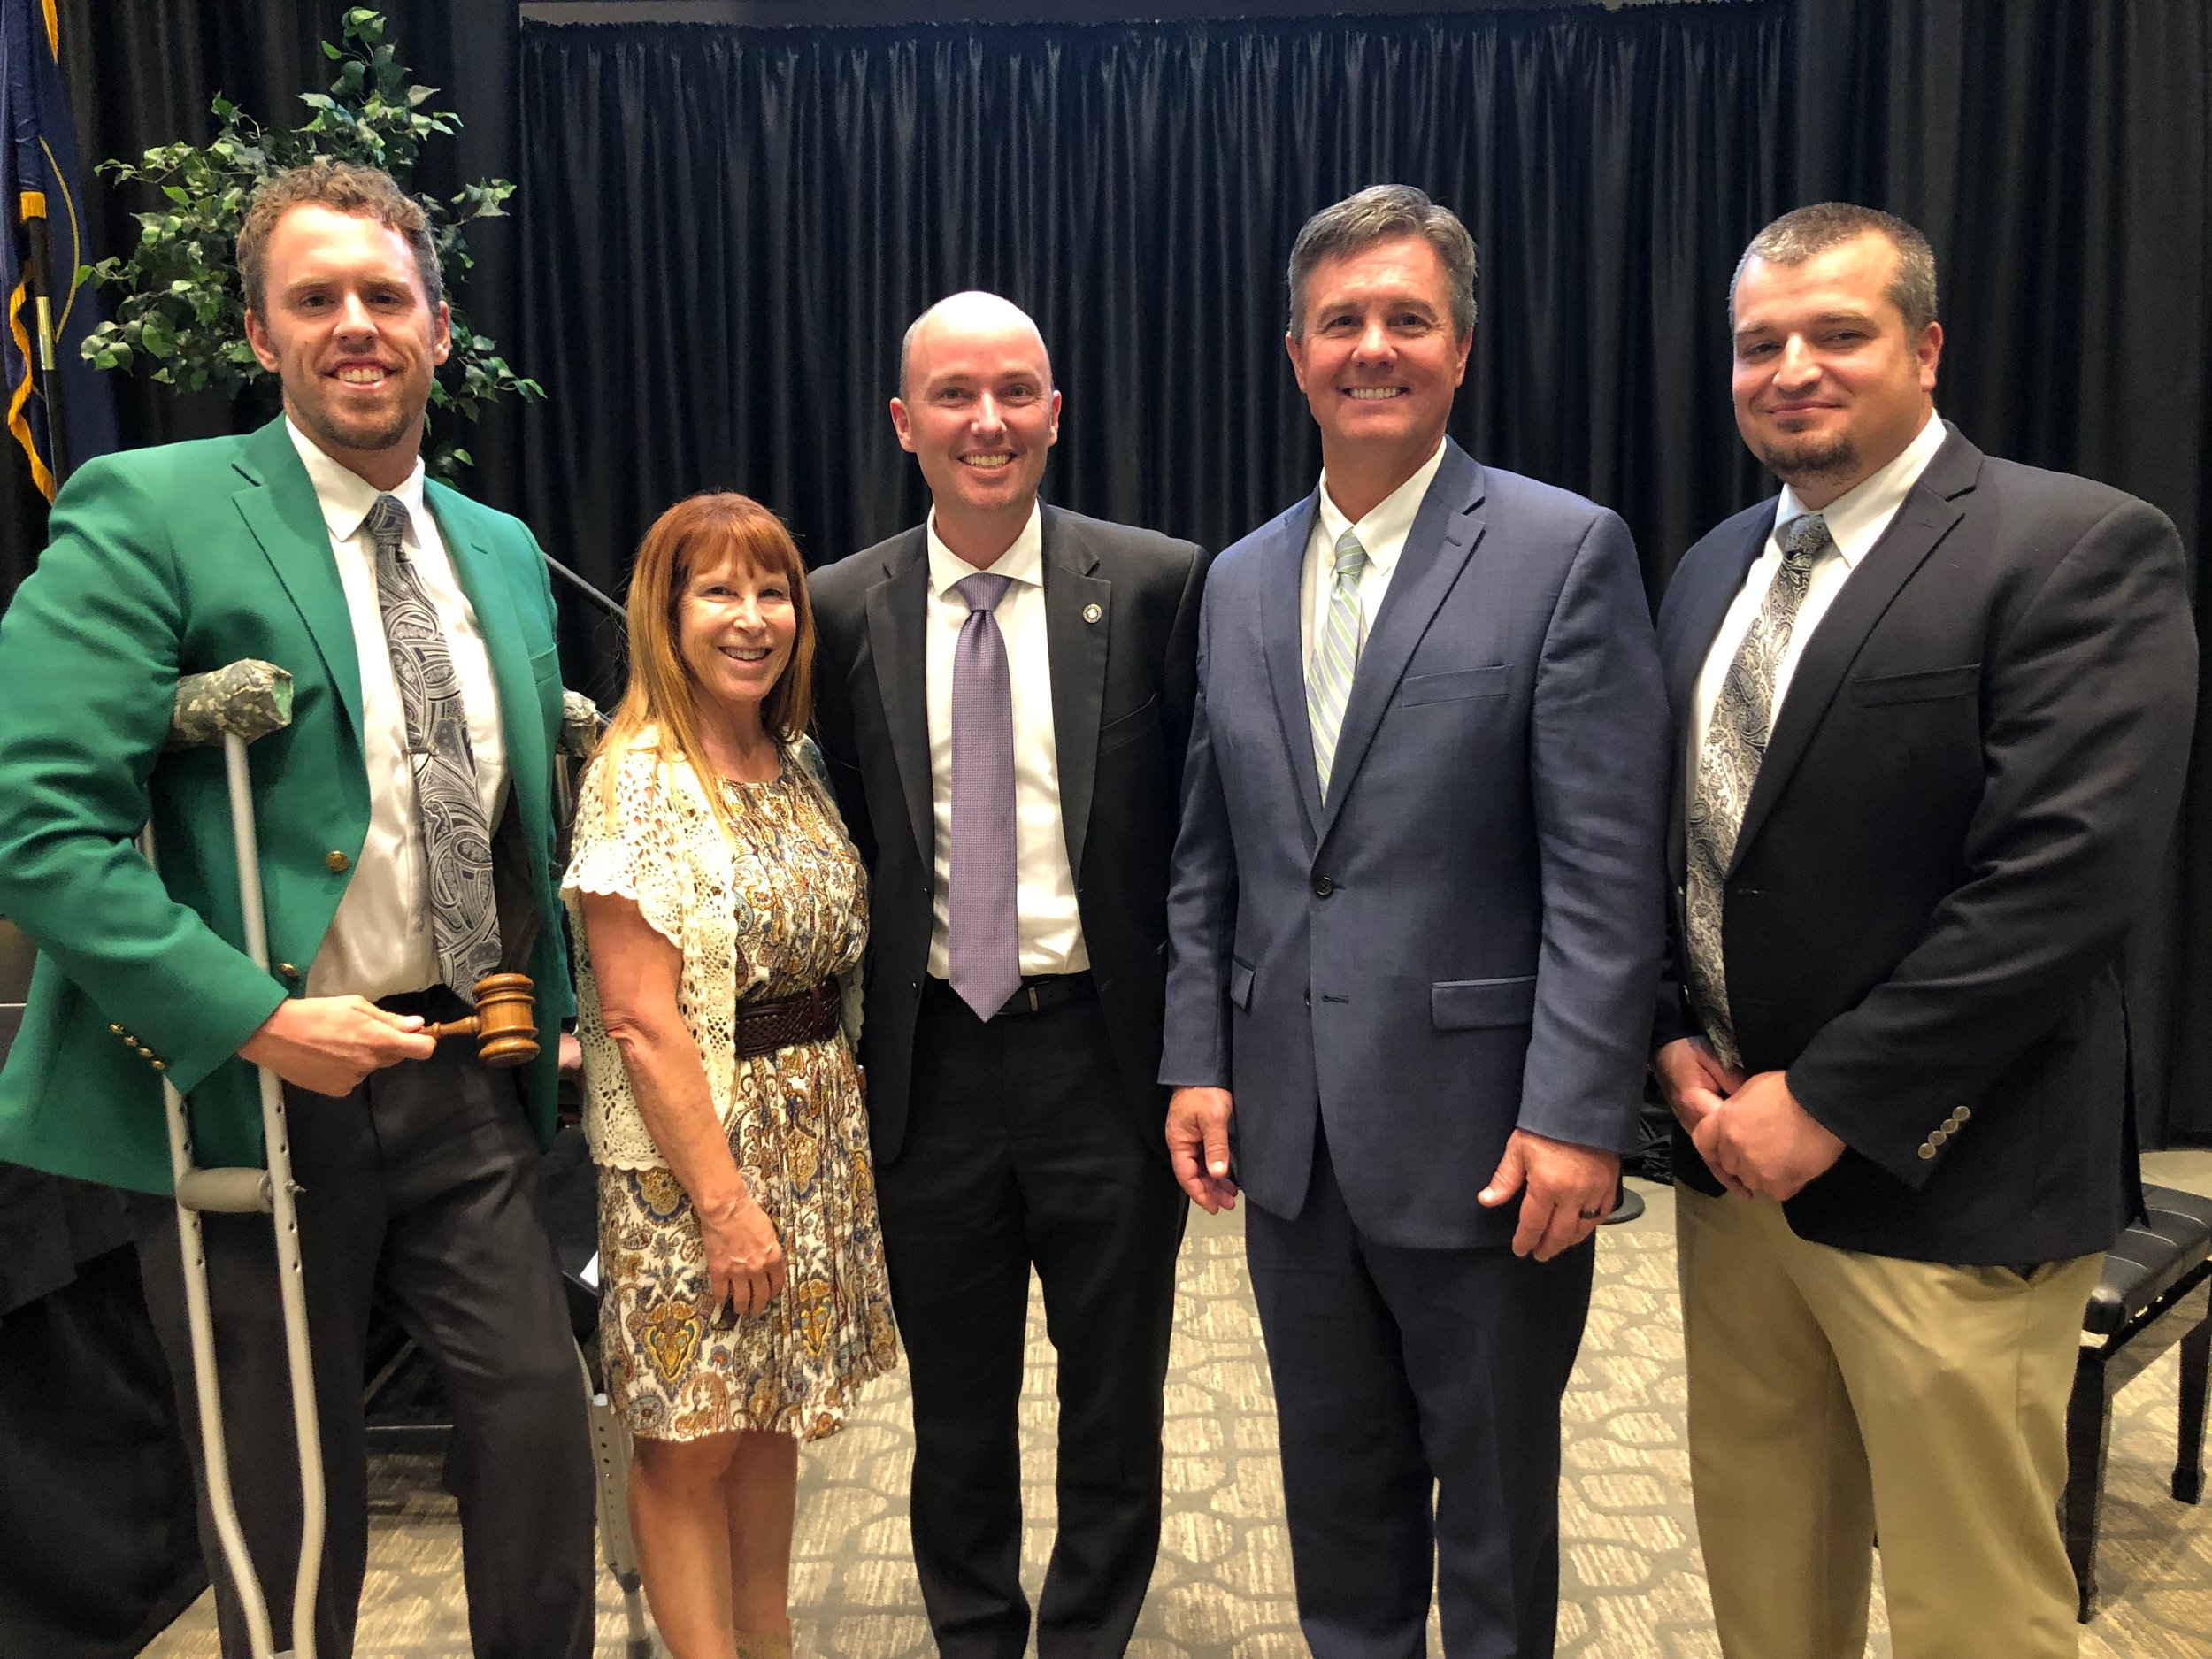 Left to right, President elect Sidney Smith, Past President Robin O'Driscoll, Lt. Gov Spencer Cox, Exec. Director Joel Brown, President Michael Fossett.